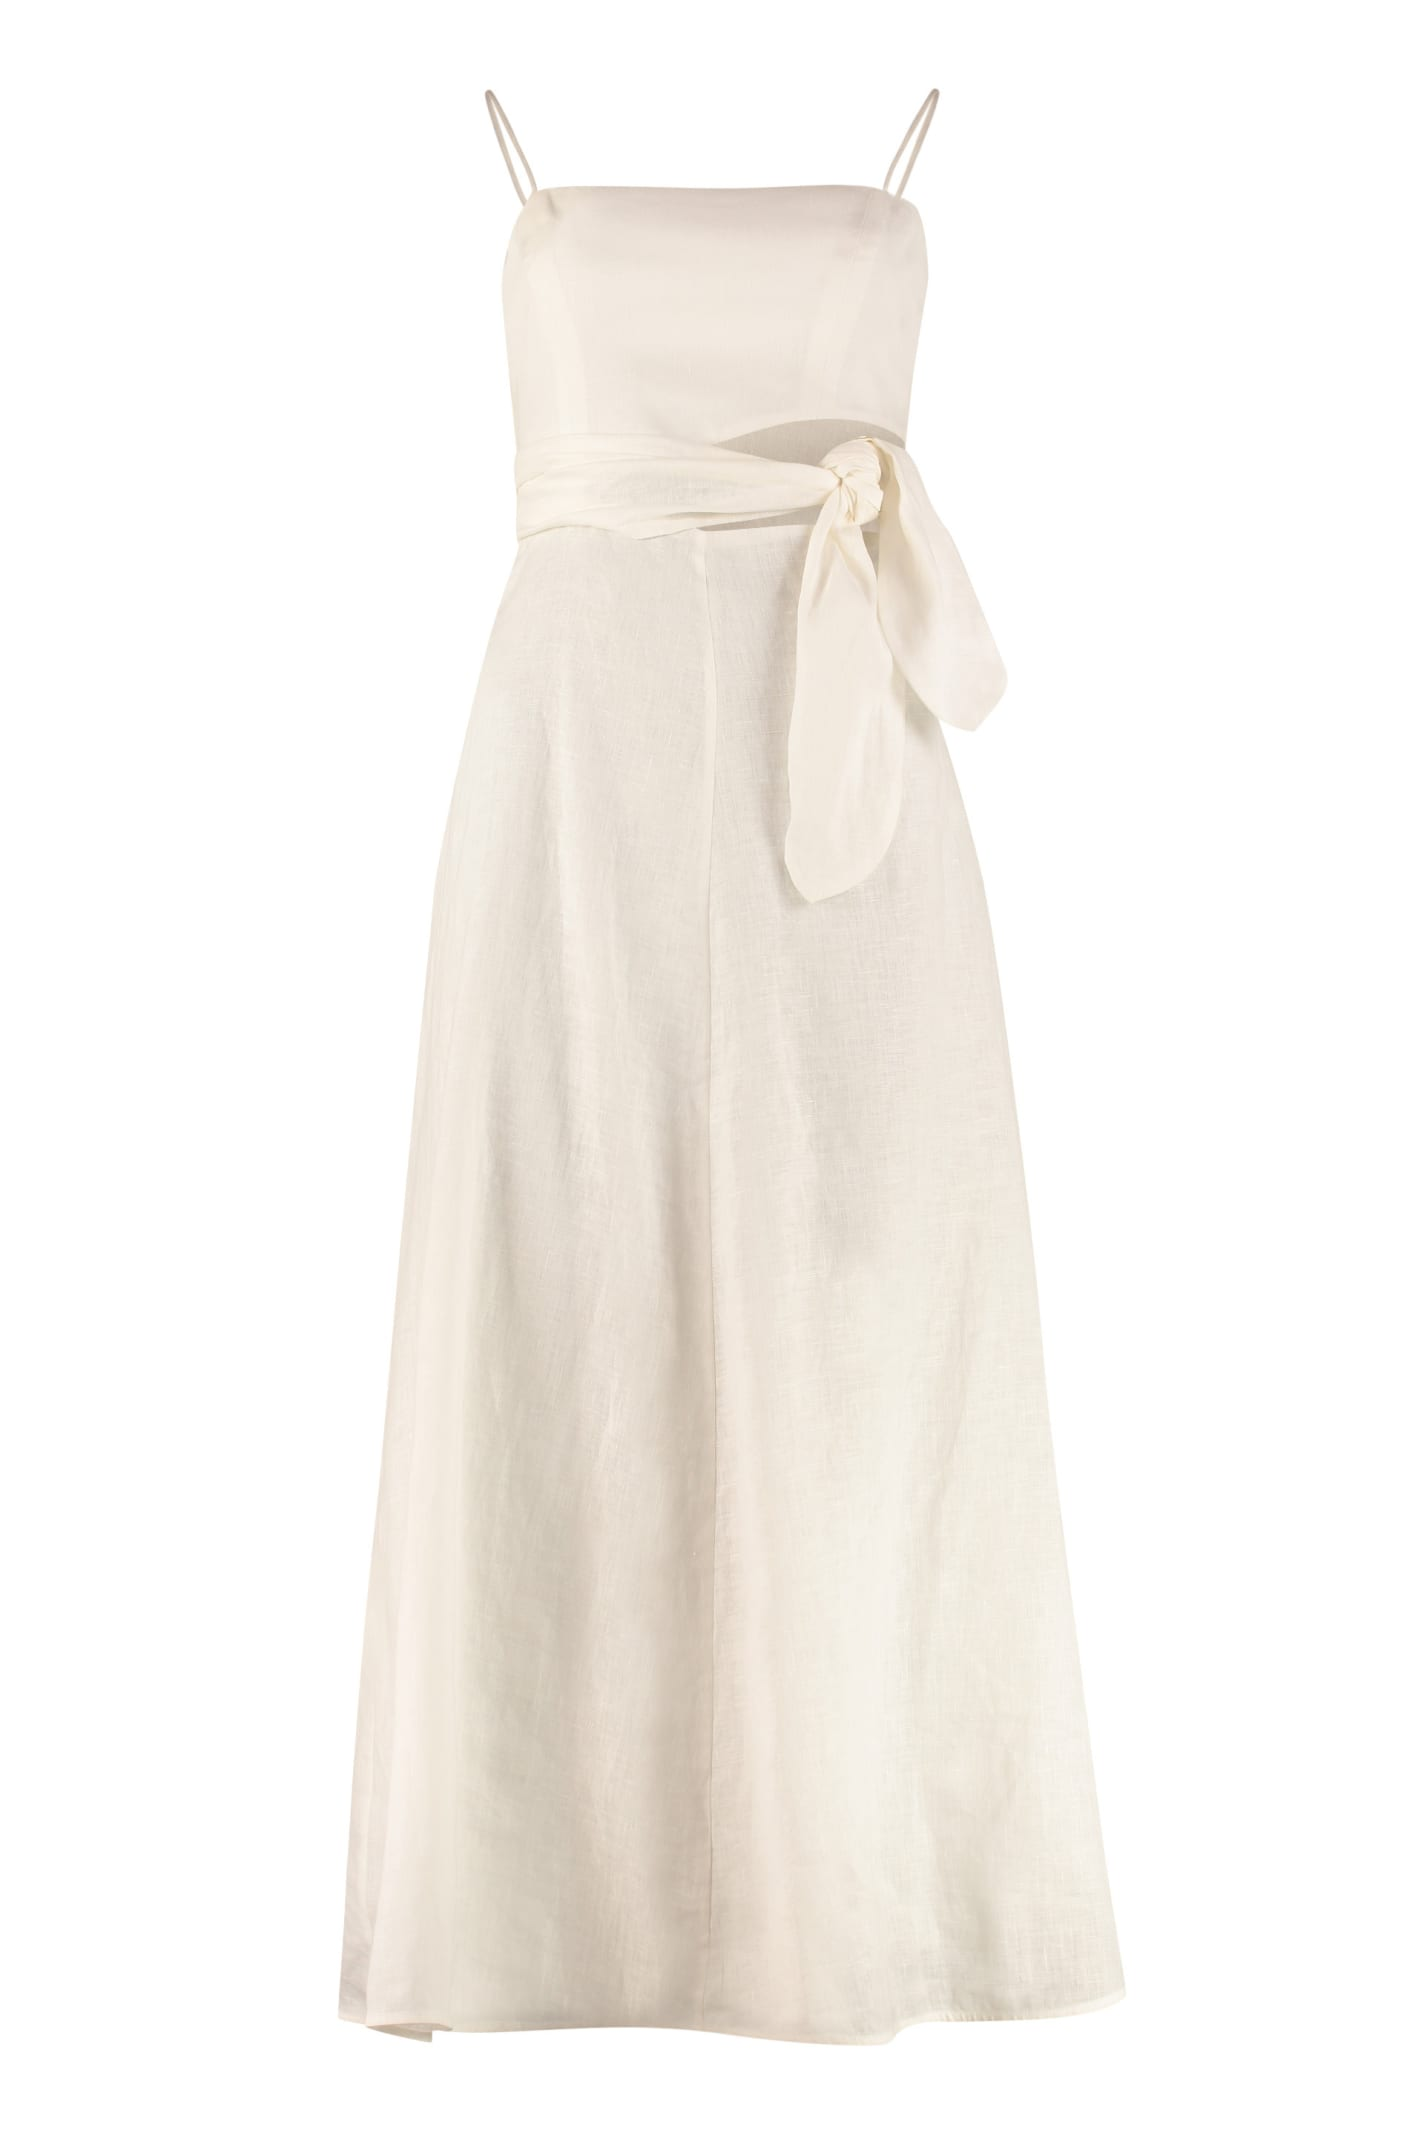 Buy Zimmermann Amelie Linen Maxi Dress online, shop Zimmermann with free shipping